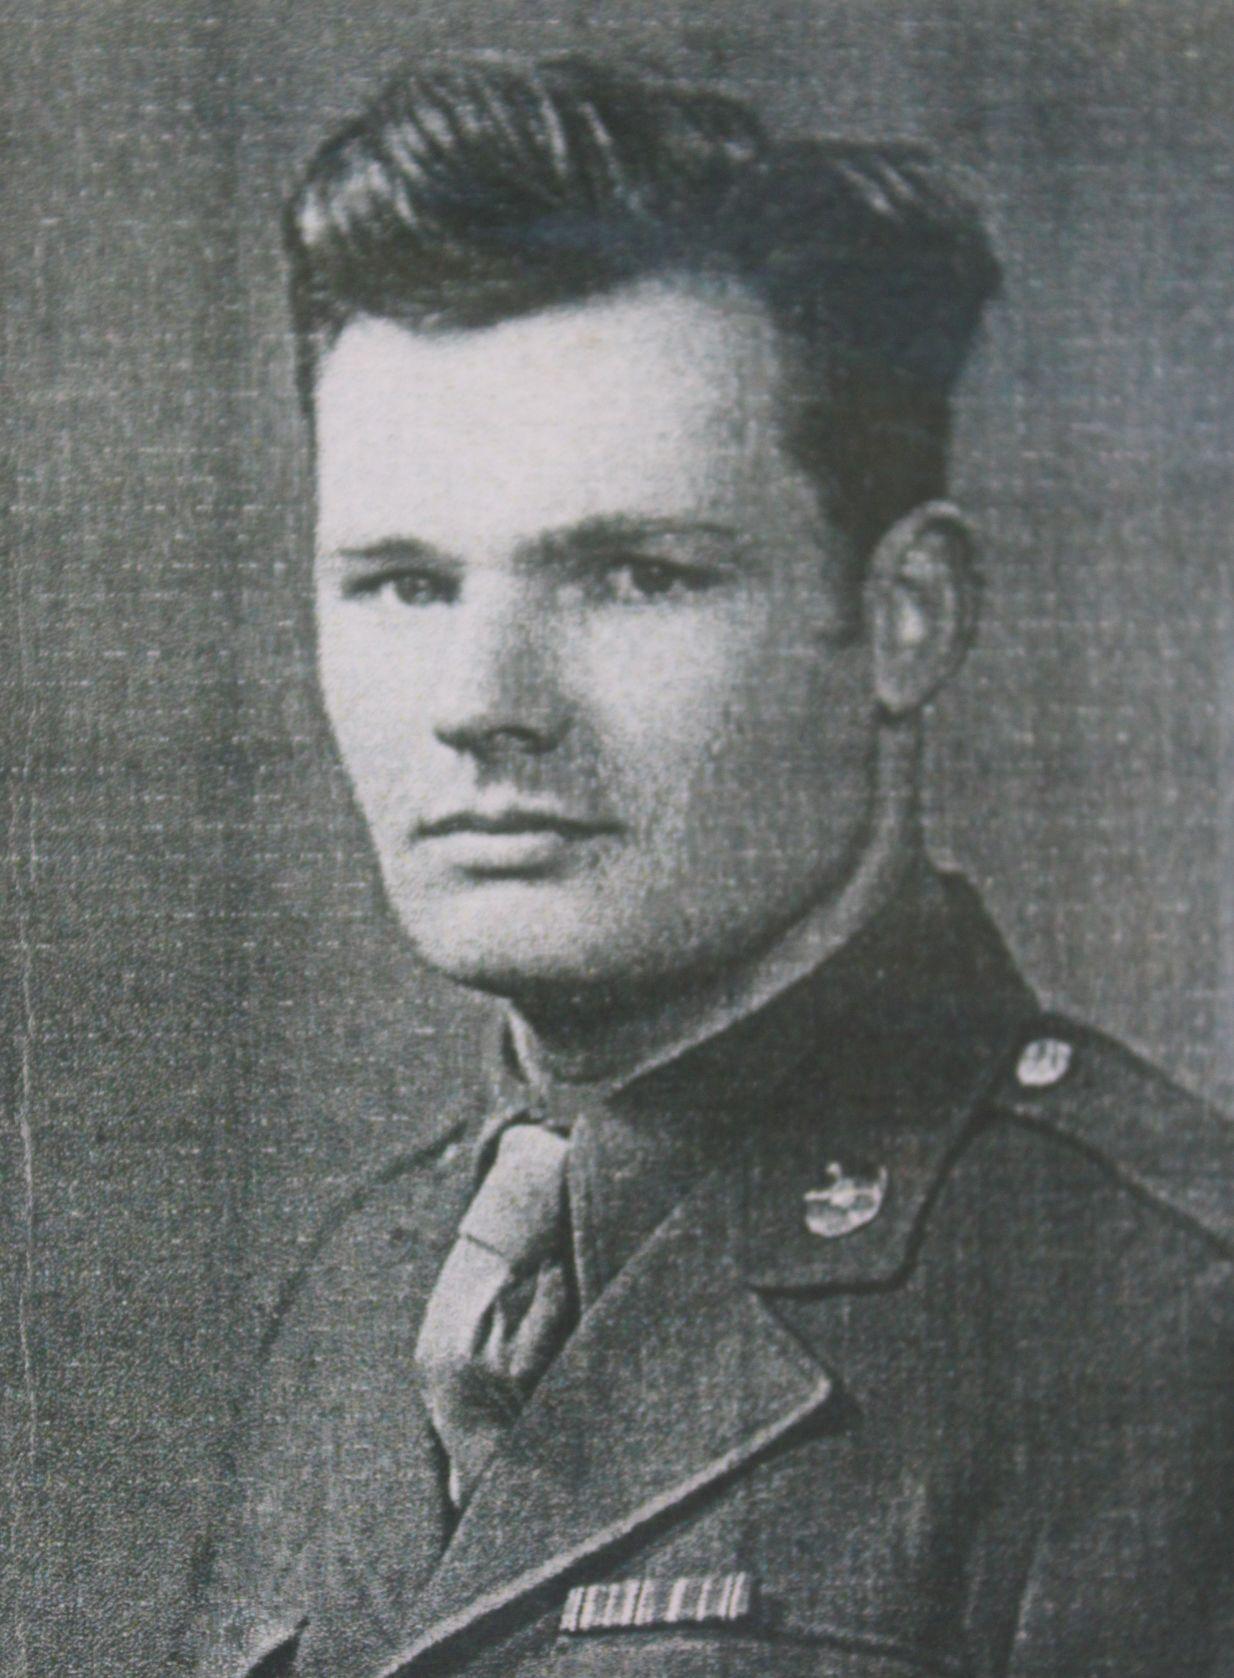 Joseph Wiggins recalls D-day, Battle of the Bulge